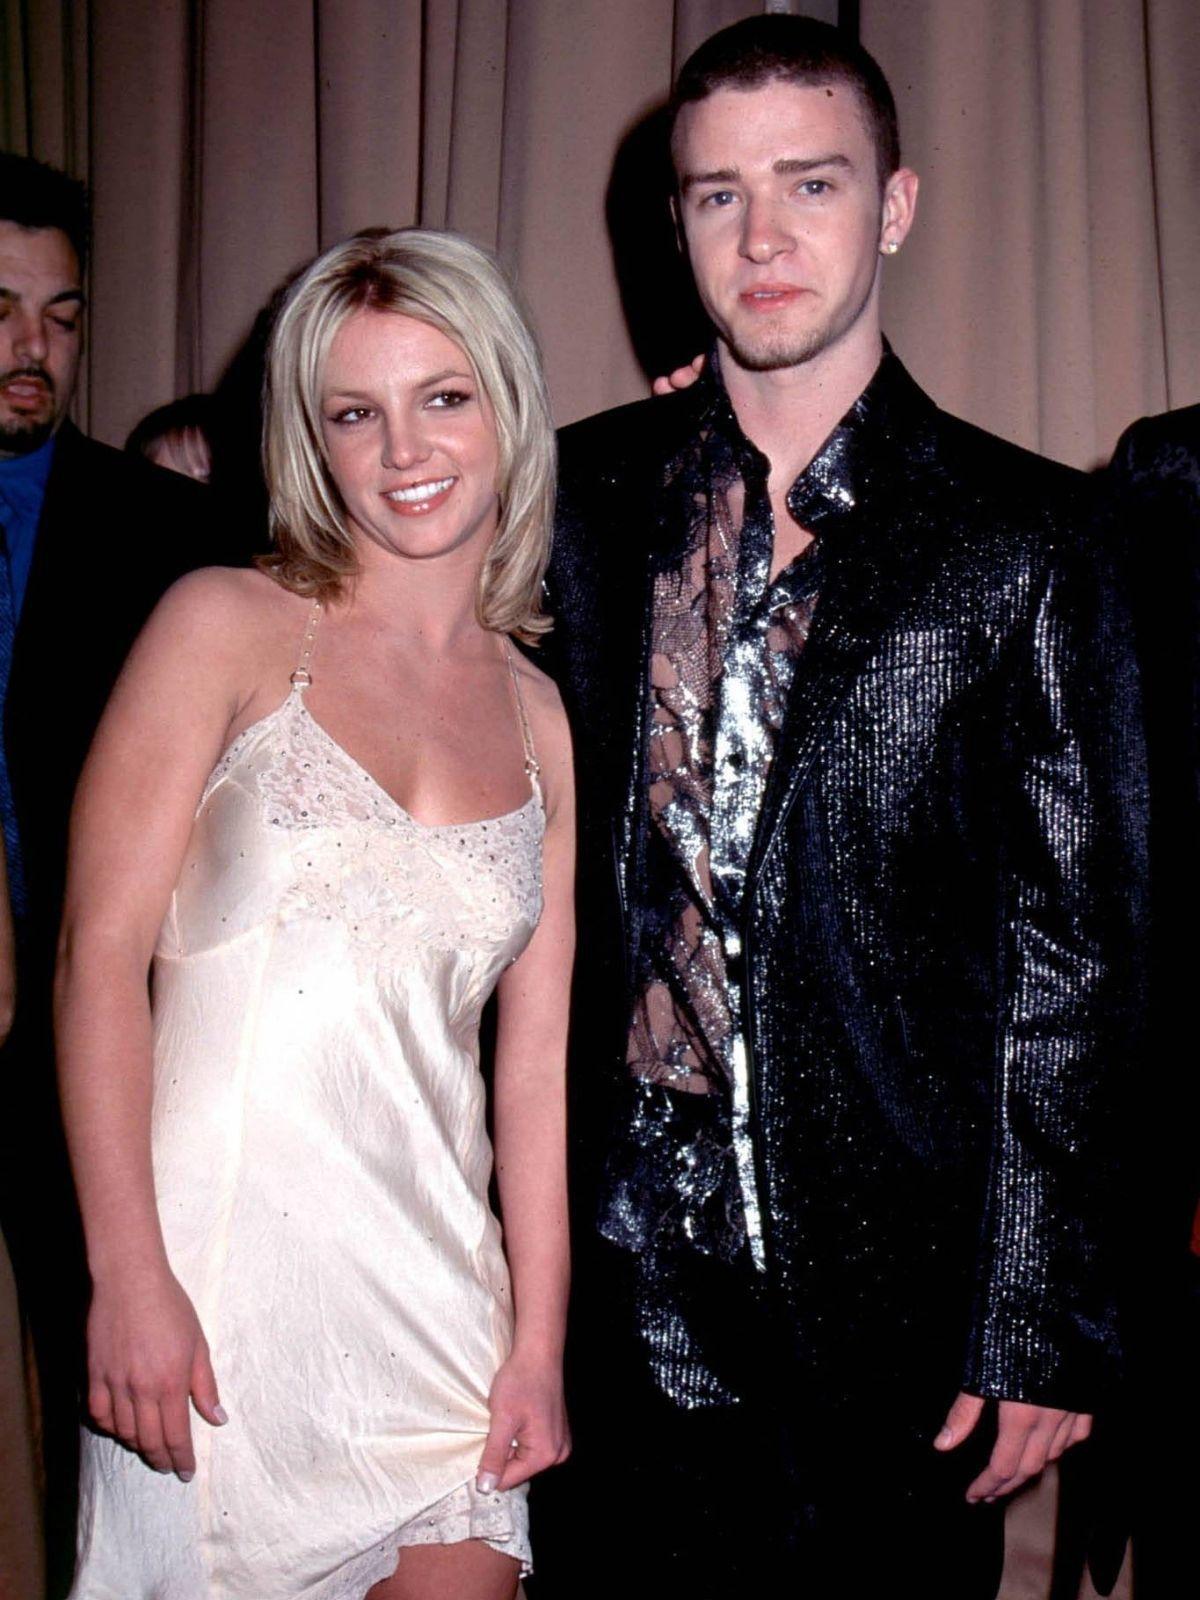 Nach Britney Spears-Doku: alle hassen Justin Timberlake